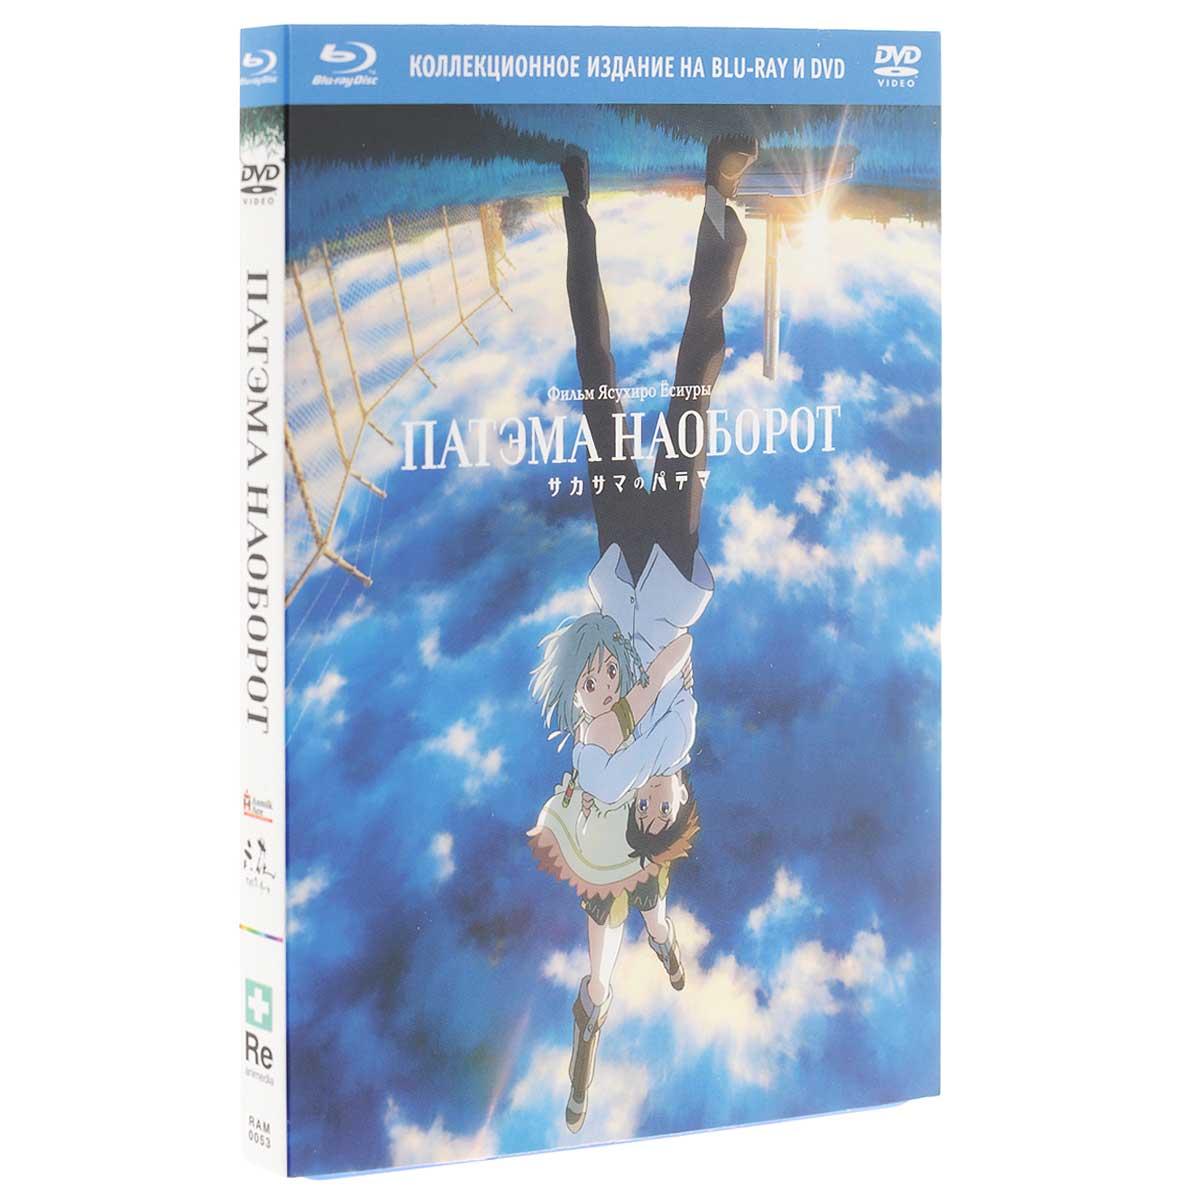 Патэма наоборот (Blu-ray + DVD)